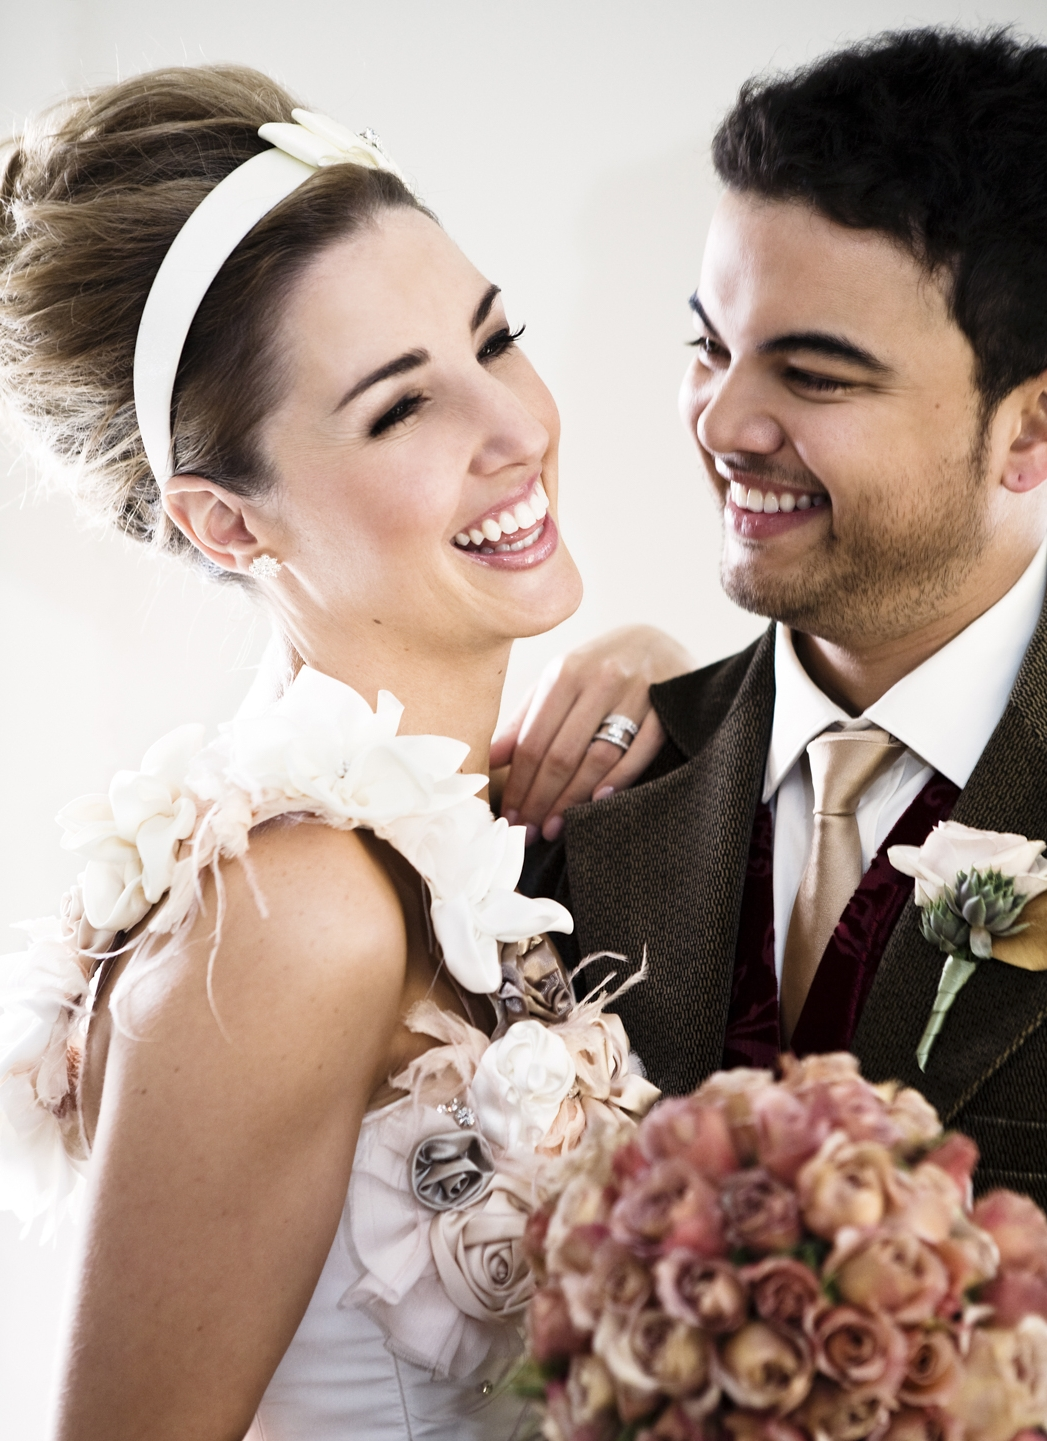 Graham photographed the wedding of Guy Sebastian and Jules Egan.